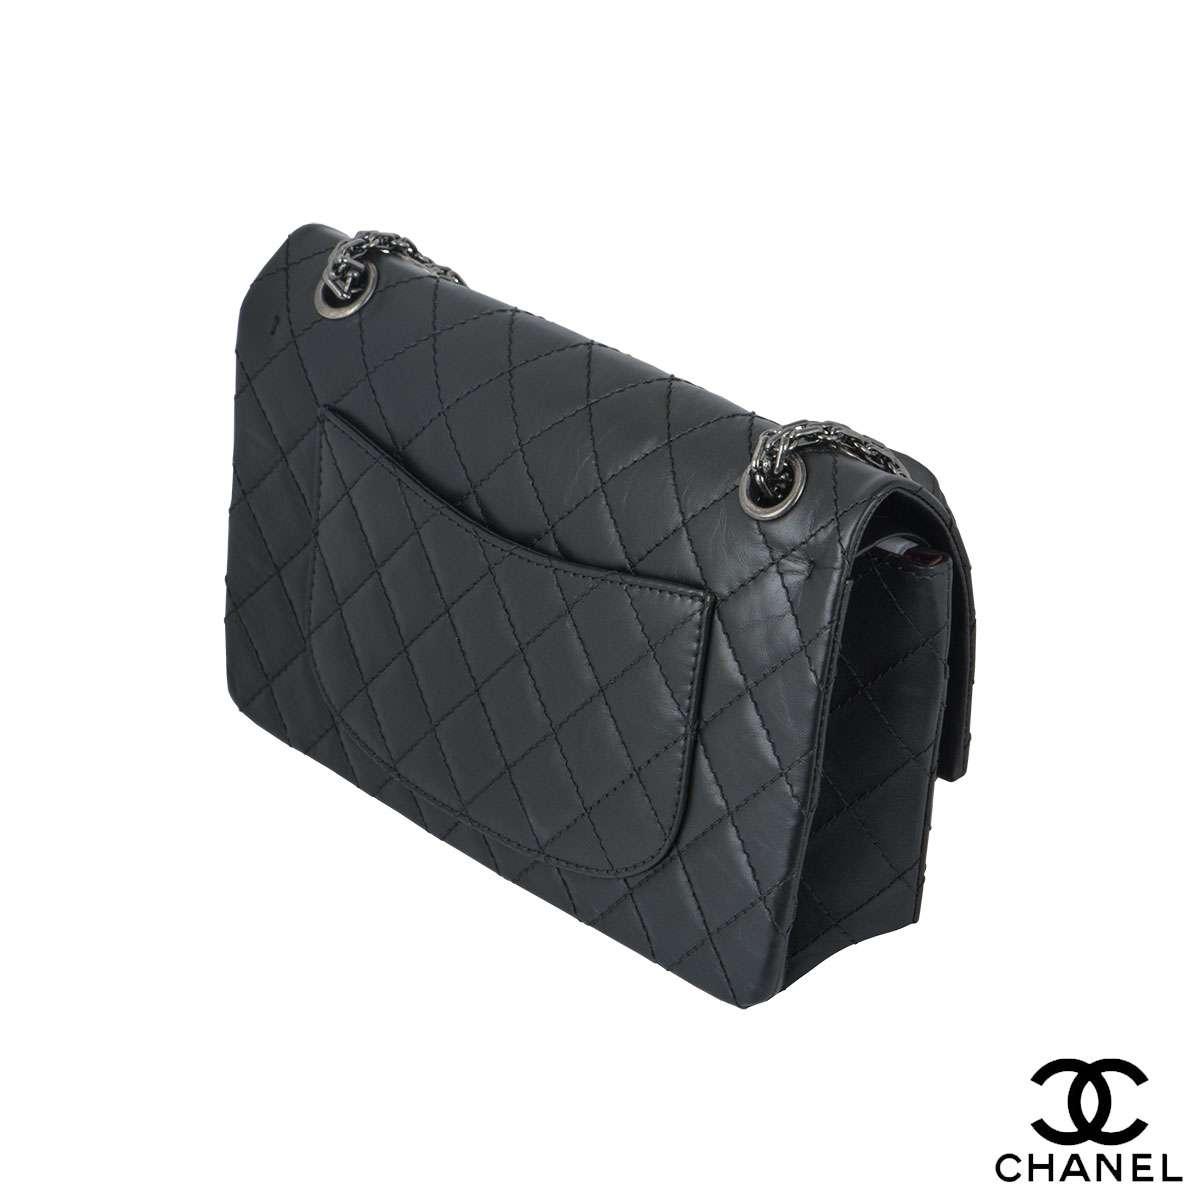 Chanel  2.55 Reissue Double flap 225 Handbag